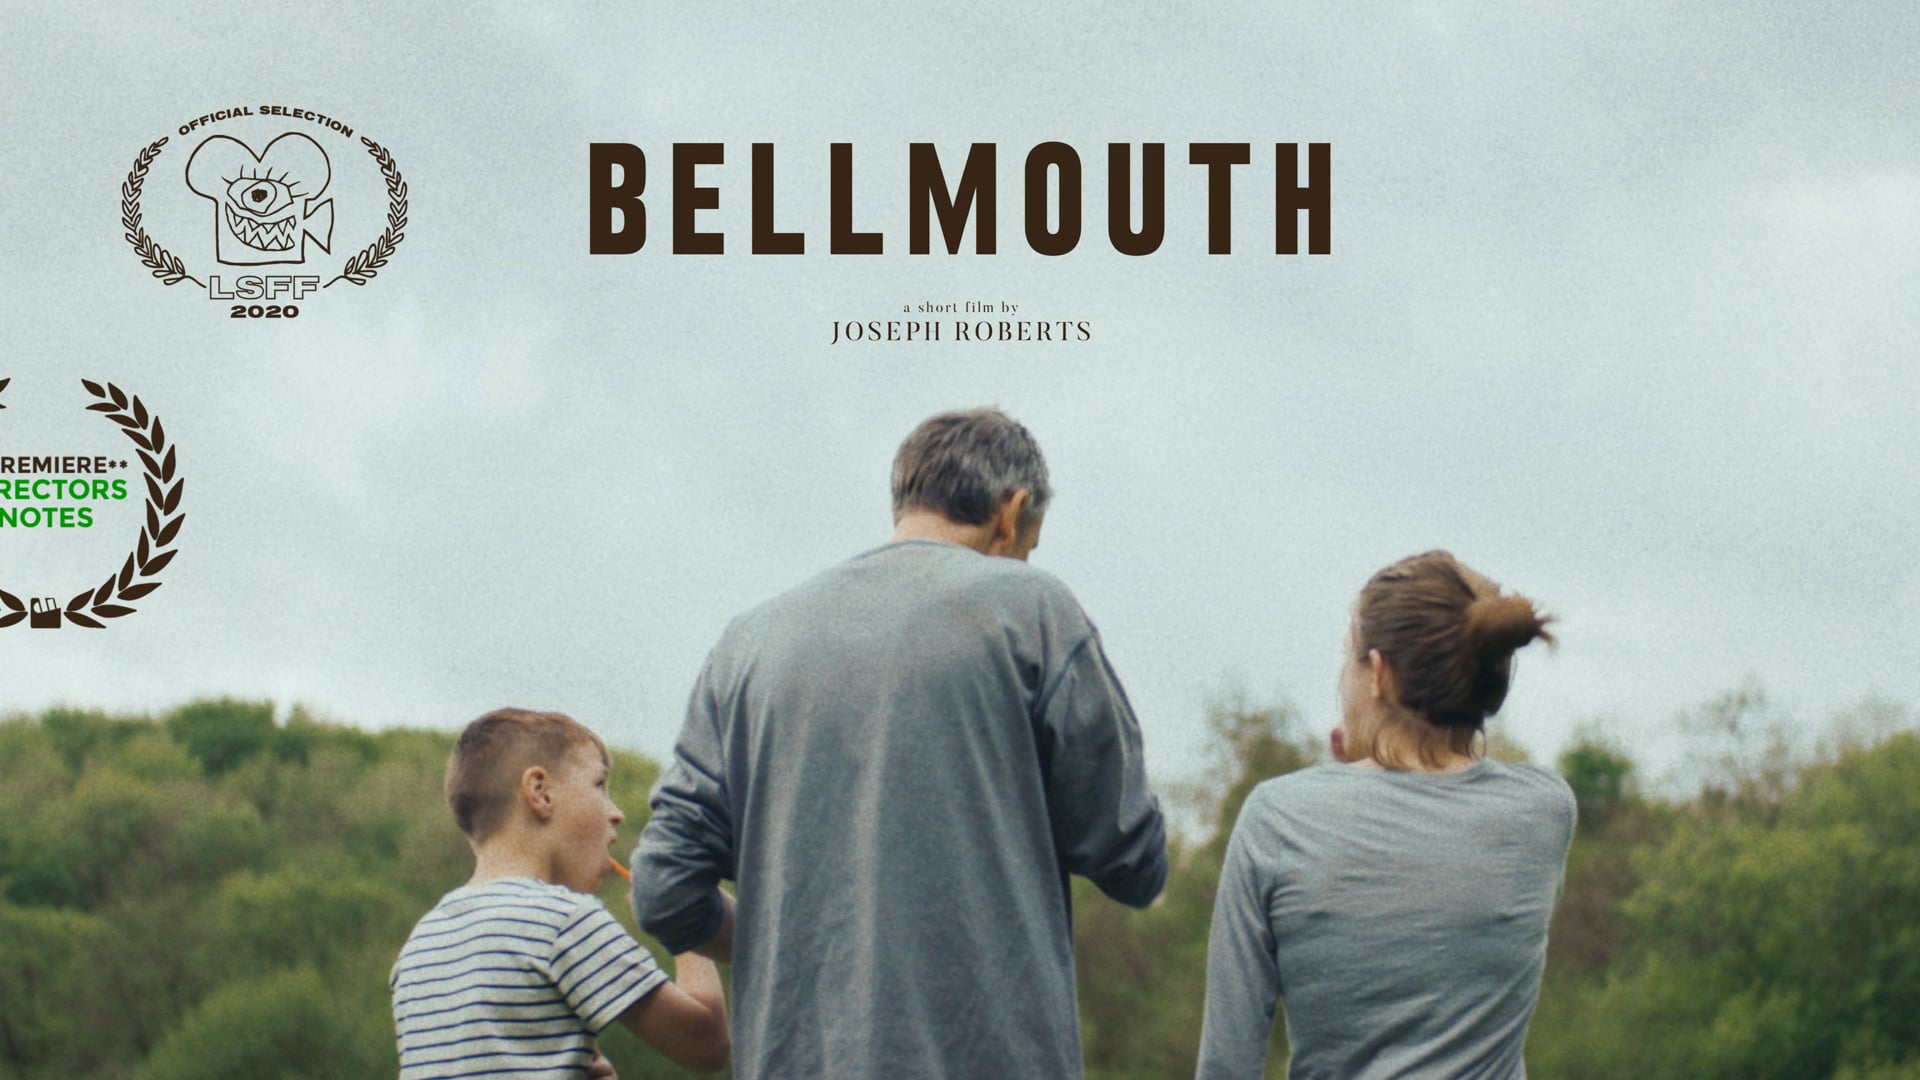 BELLMOUTH by Joe Roberts